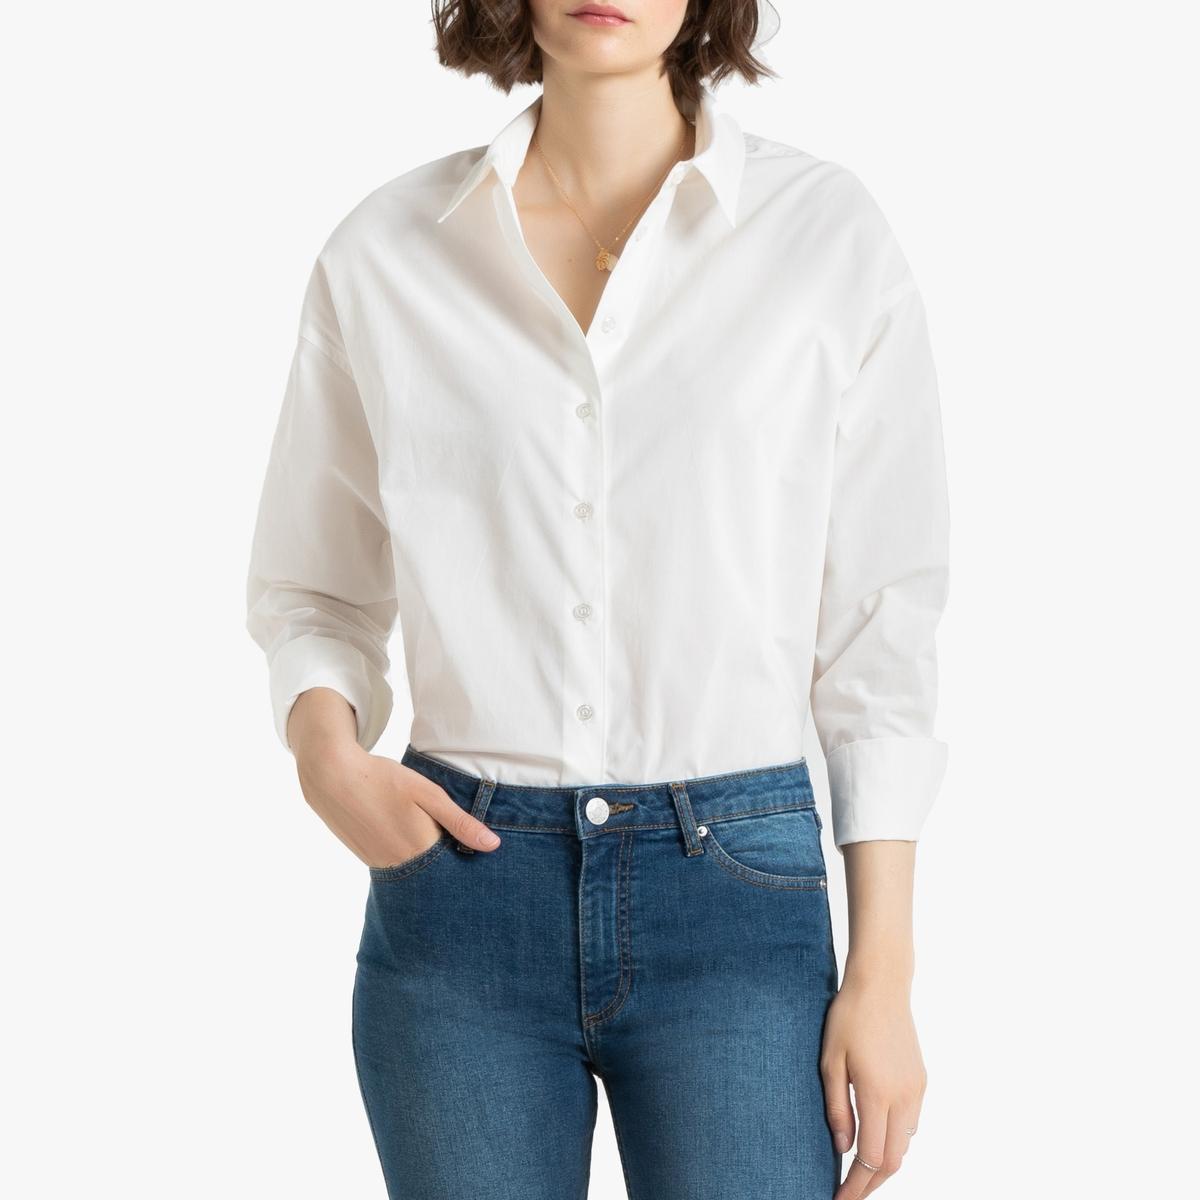 Camisa de popelina de algodón, de manga larga